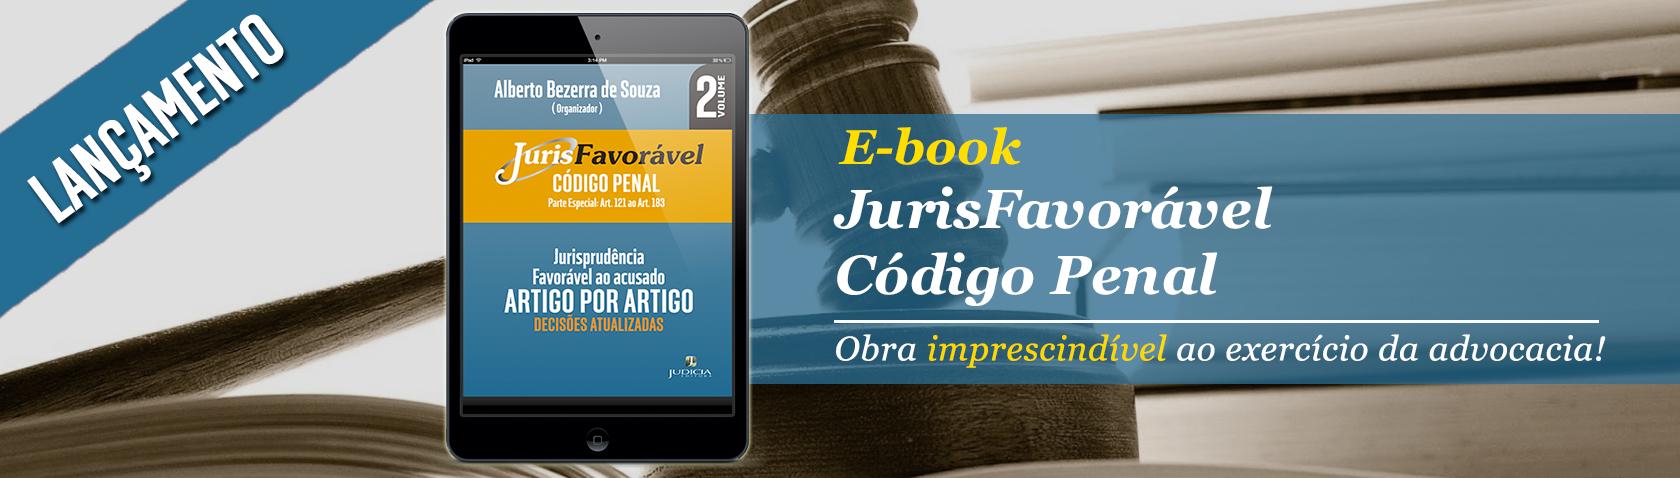 banner_lancamento_jurisfavoravel_direito_penal_02